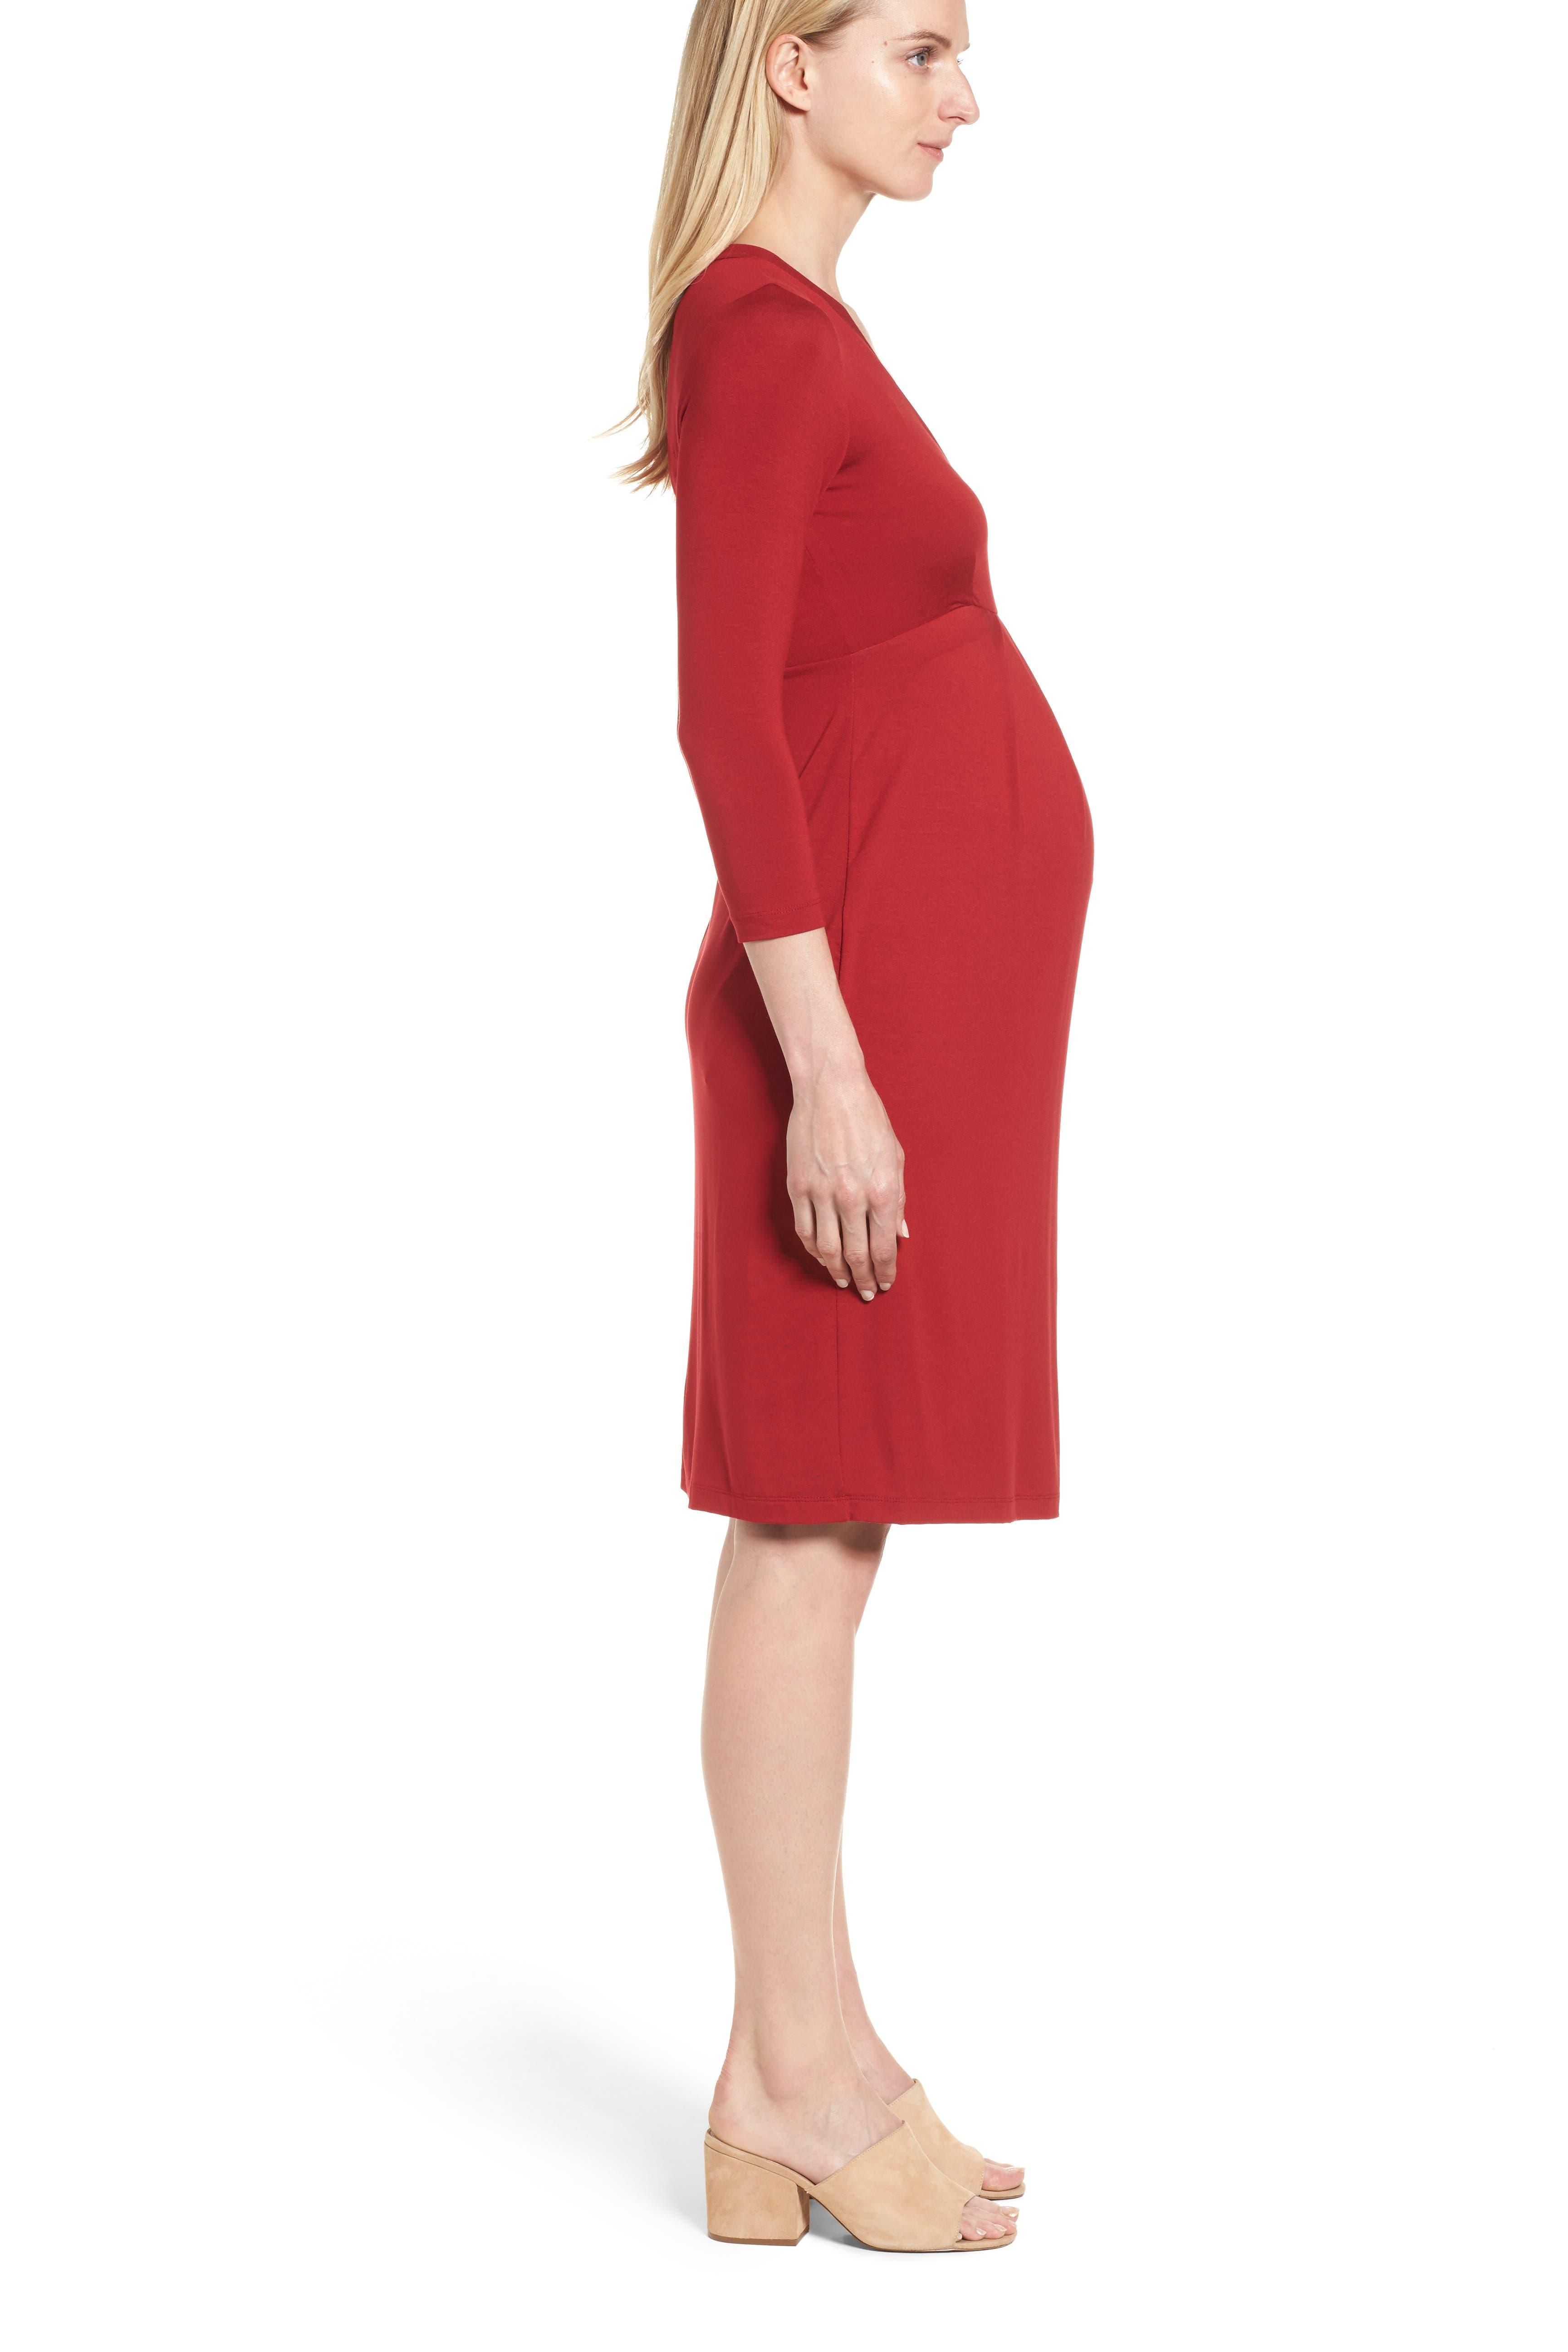 ISABELLA OLIVER,                             Gracia Surplice Maternity Dress,                             Alternate thumbnail 3, color,                             CARDAMOM RED